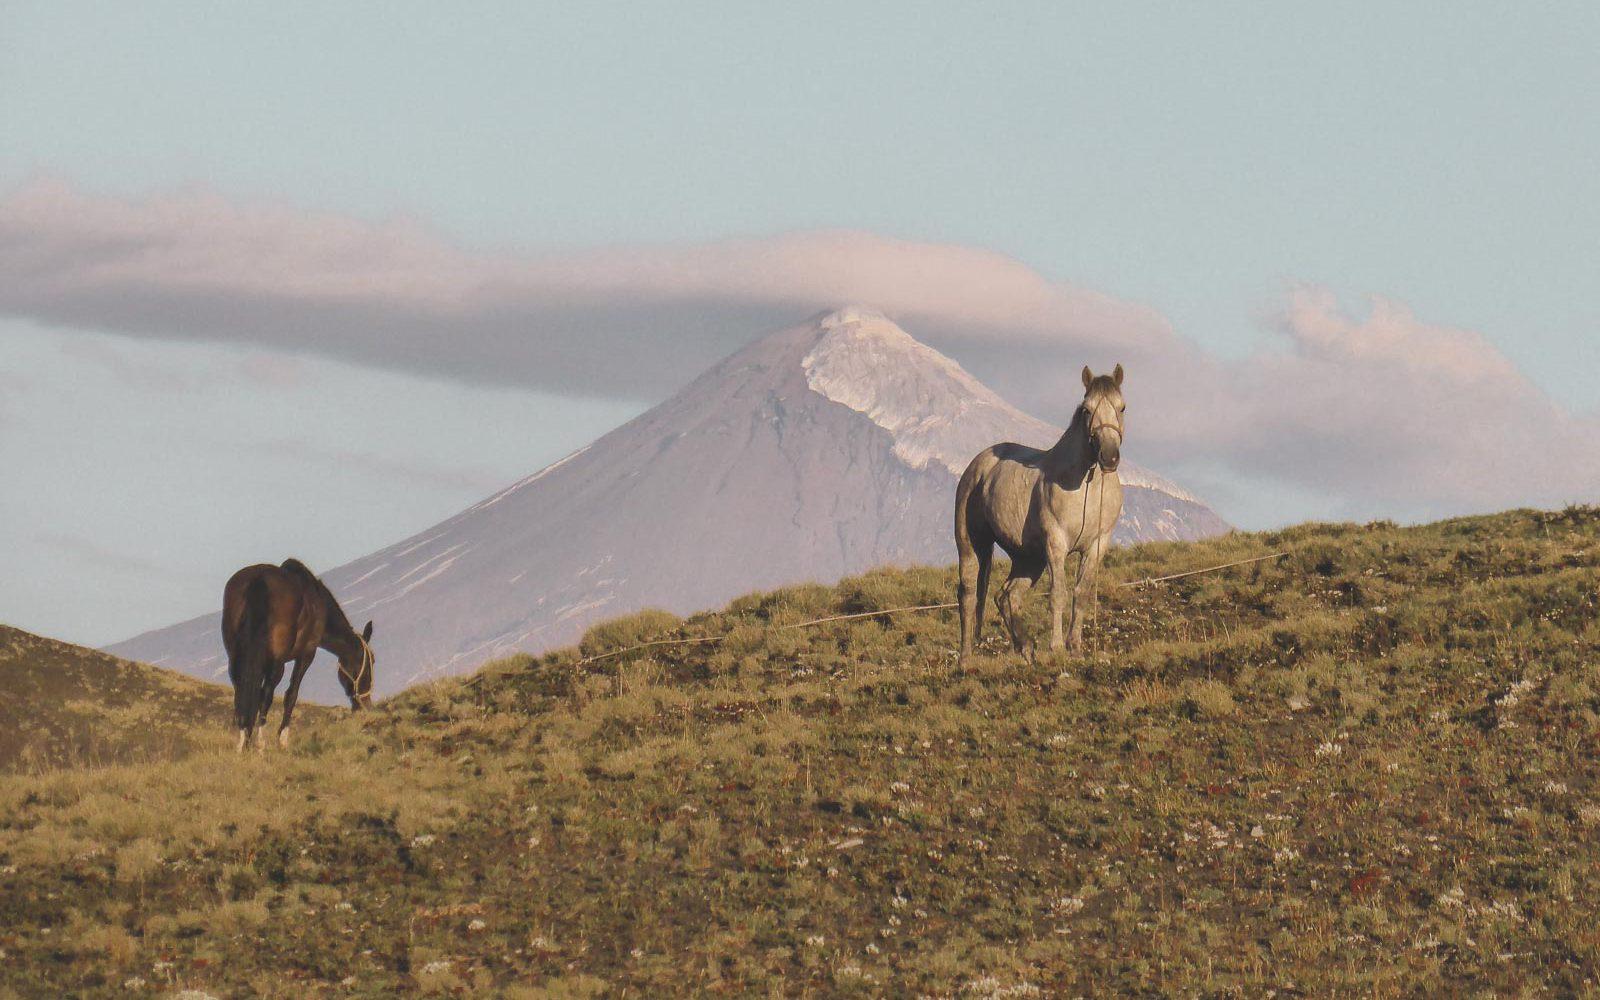 Trailride vor dem Lanin Vulkan an der chilenisch argentinischen Grenze